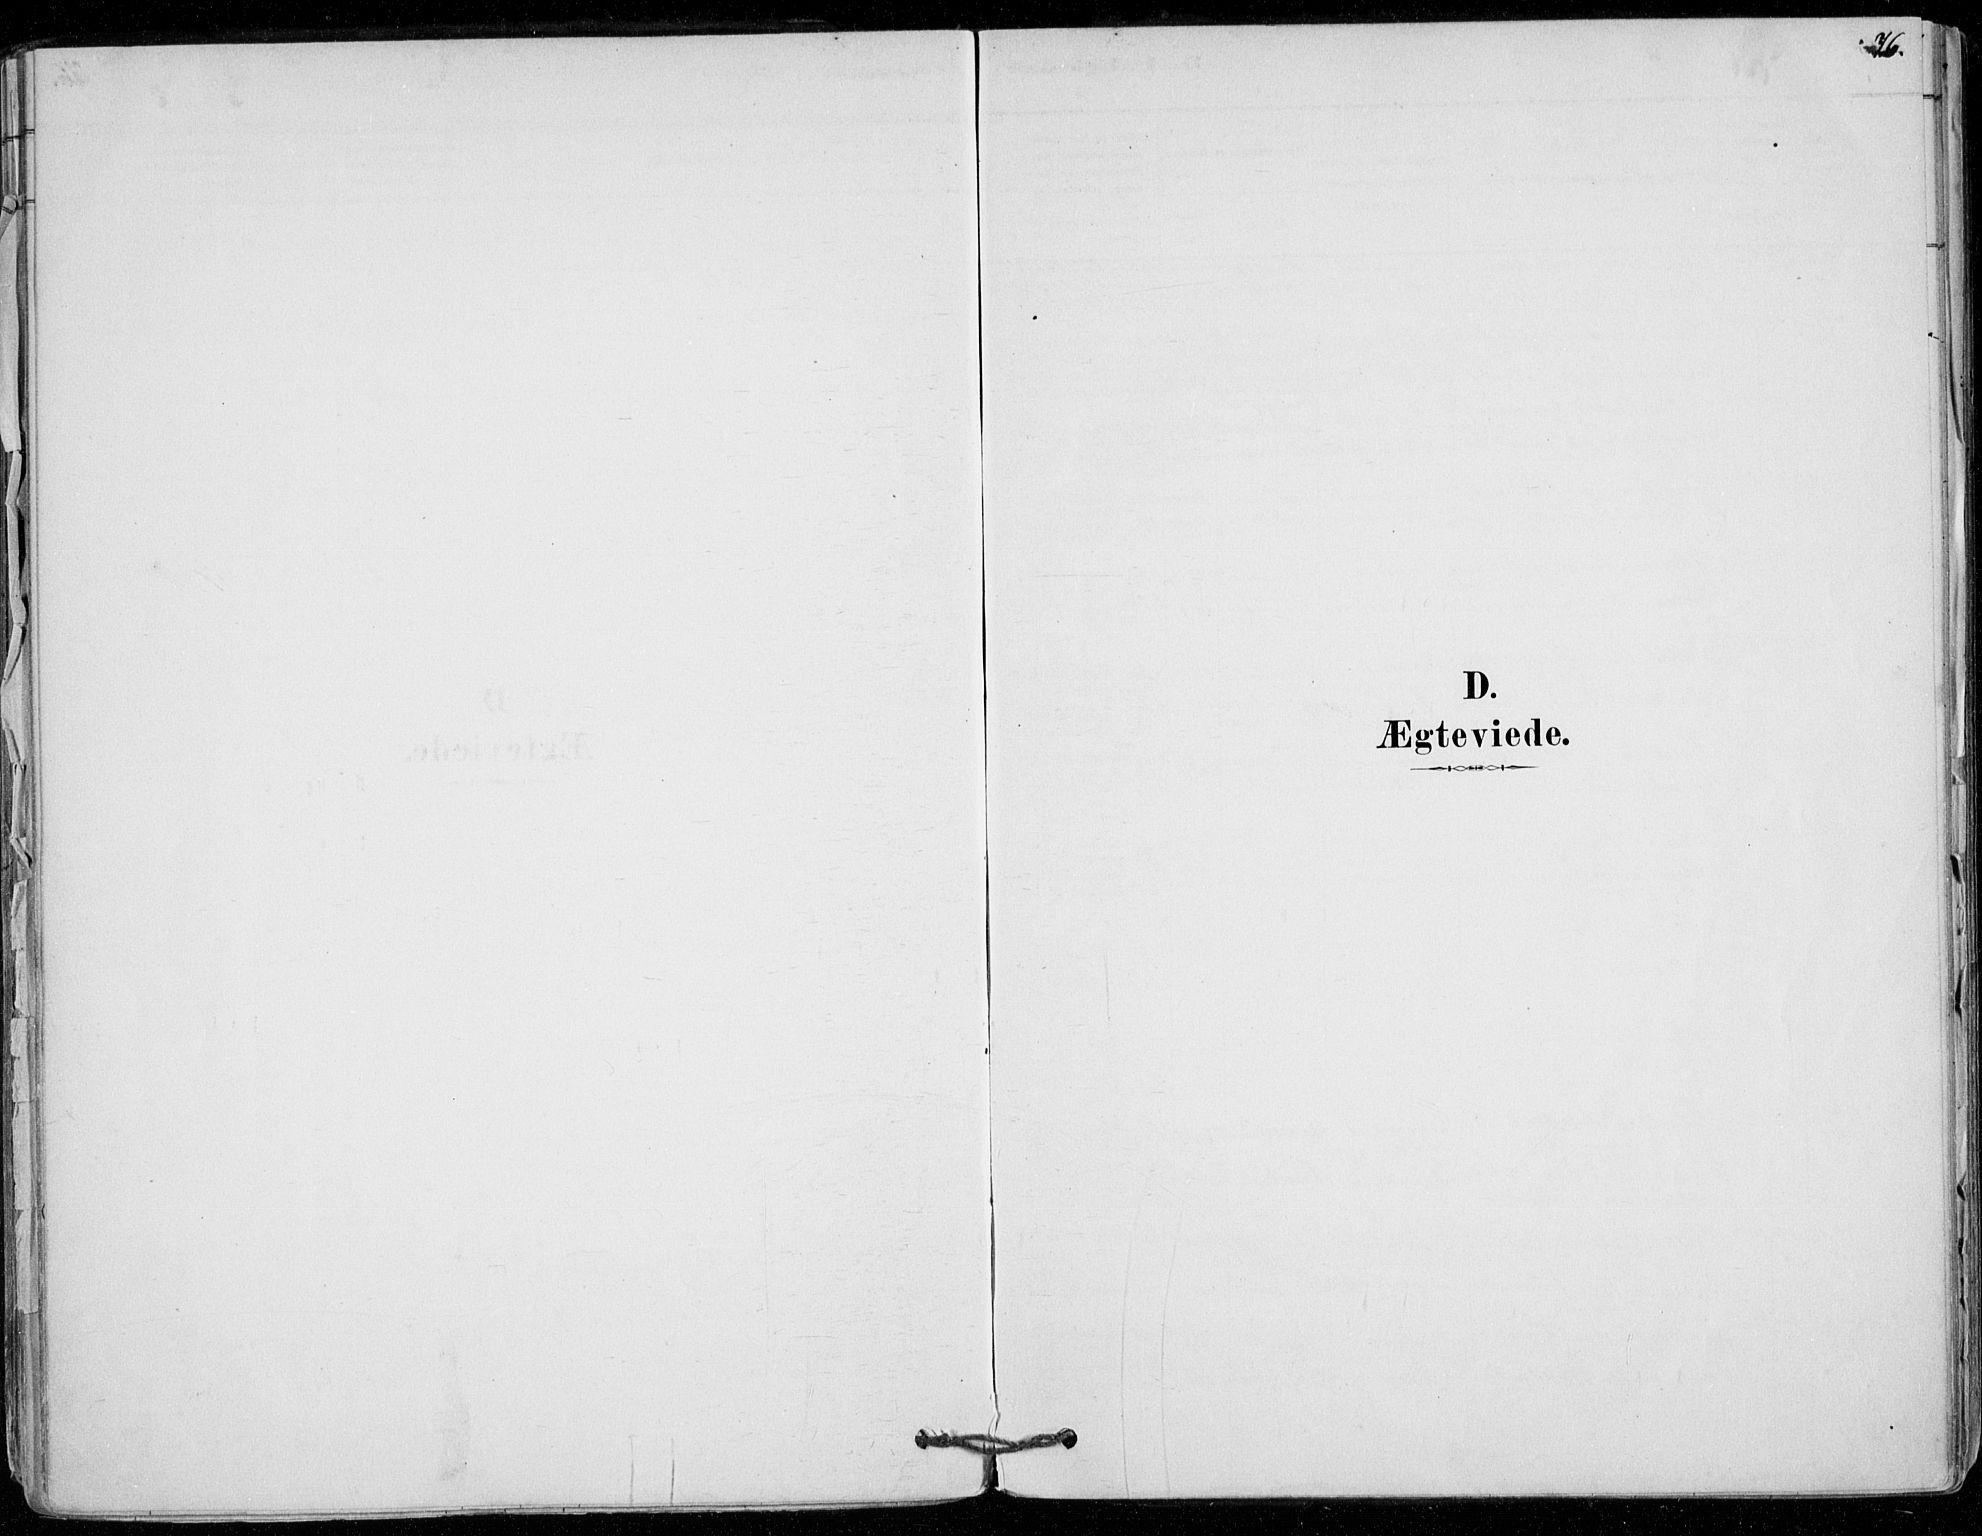 SAO, Vestby prestekontor Kirkebøker, F/Fd/L0001: Ministerialbok nr. IV 1, 1878-1945, s. 76